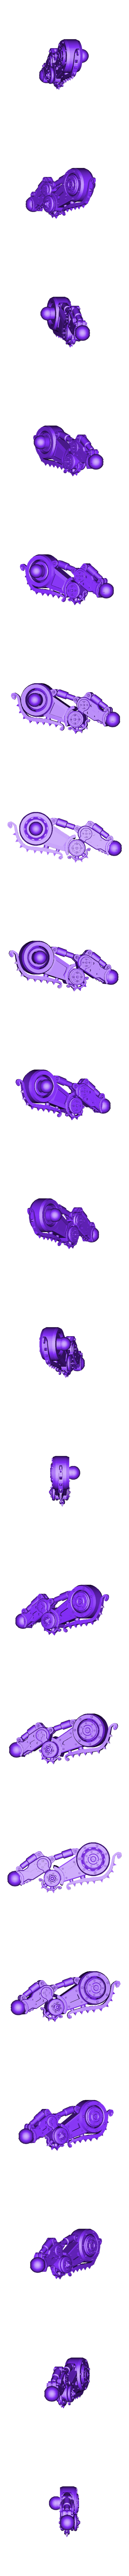 Penny 2.0 Leg 2.stl Download STL file Penny Nun Bot 2.0 • 3D print model, Leesedrenfort